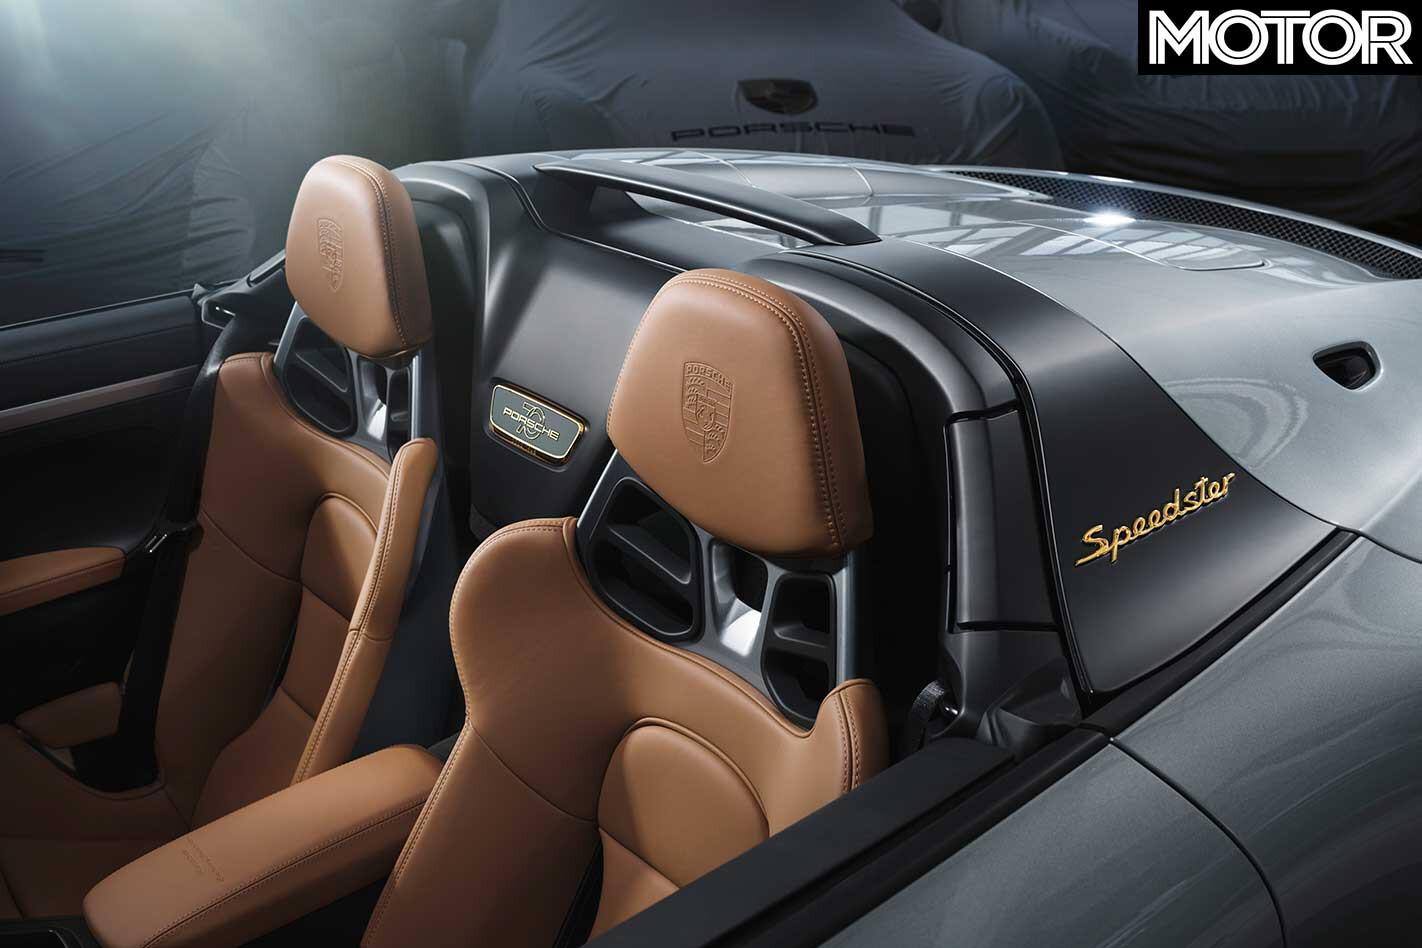 2019 Porsche 911 Speedster Double Bubble Rear Deck Jpg